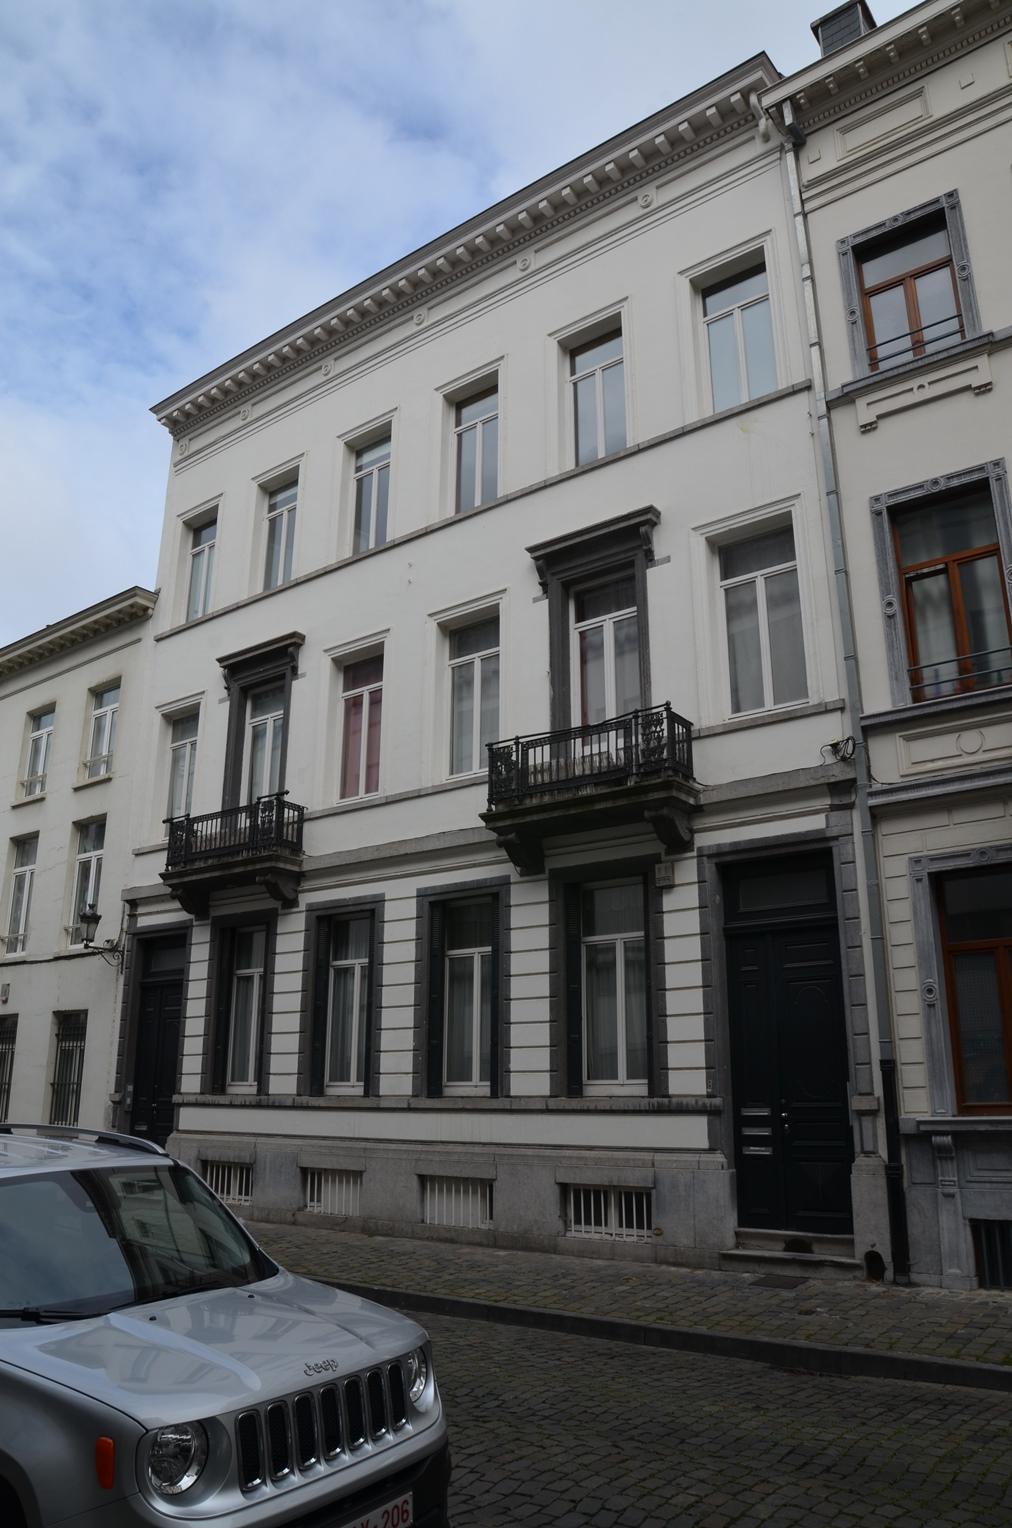 Populierstraat 6,8, 2015